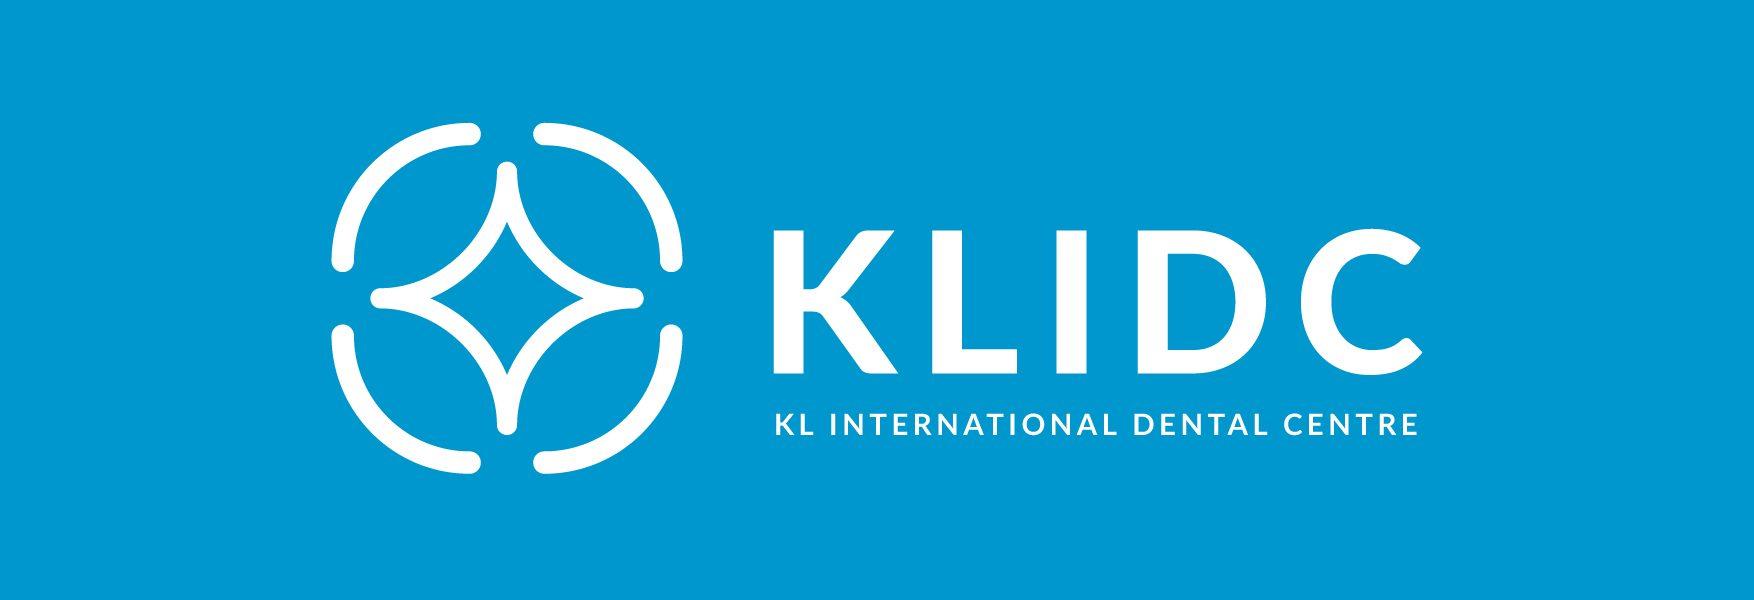 KLIDC-Branding-Mockup-02